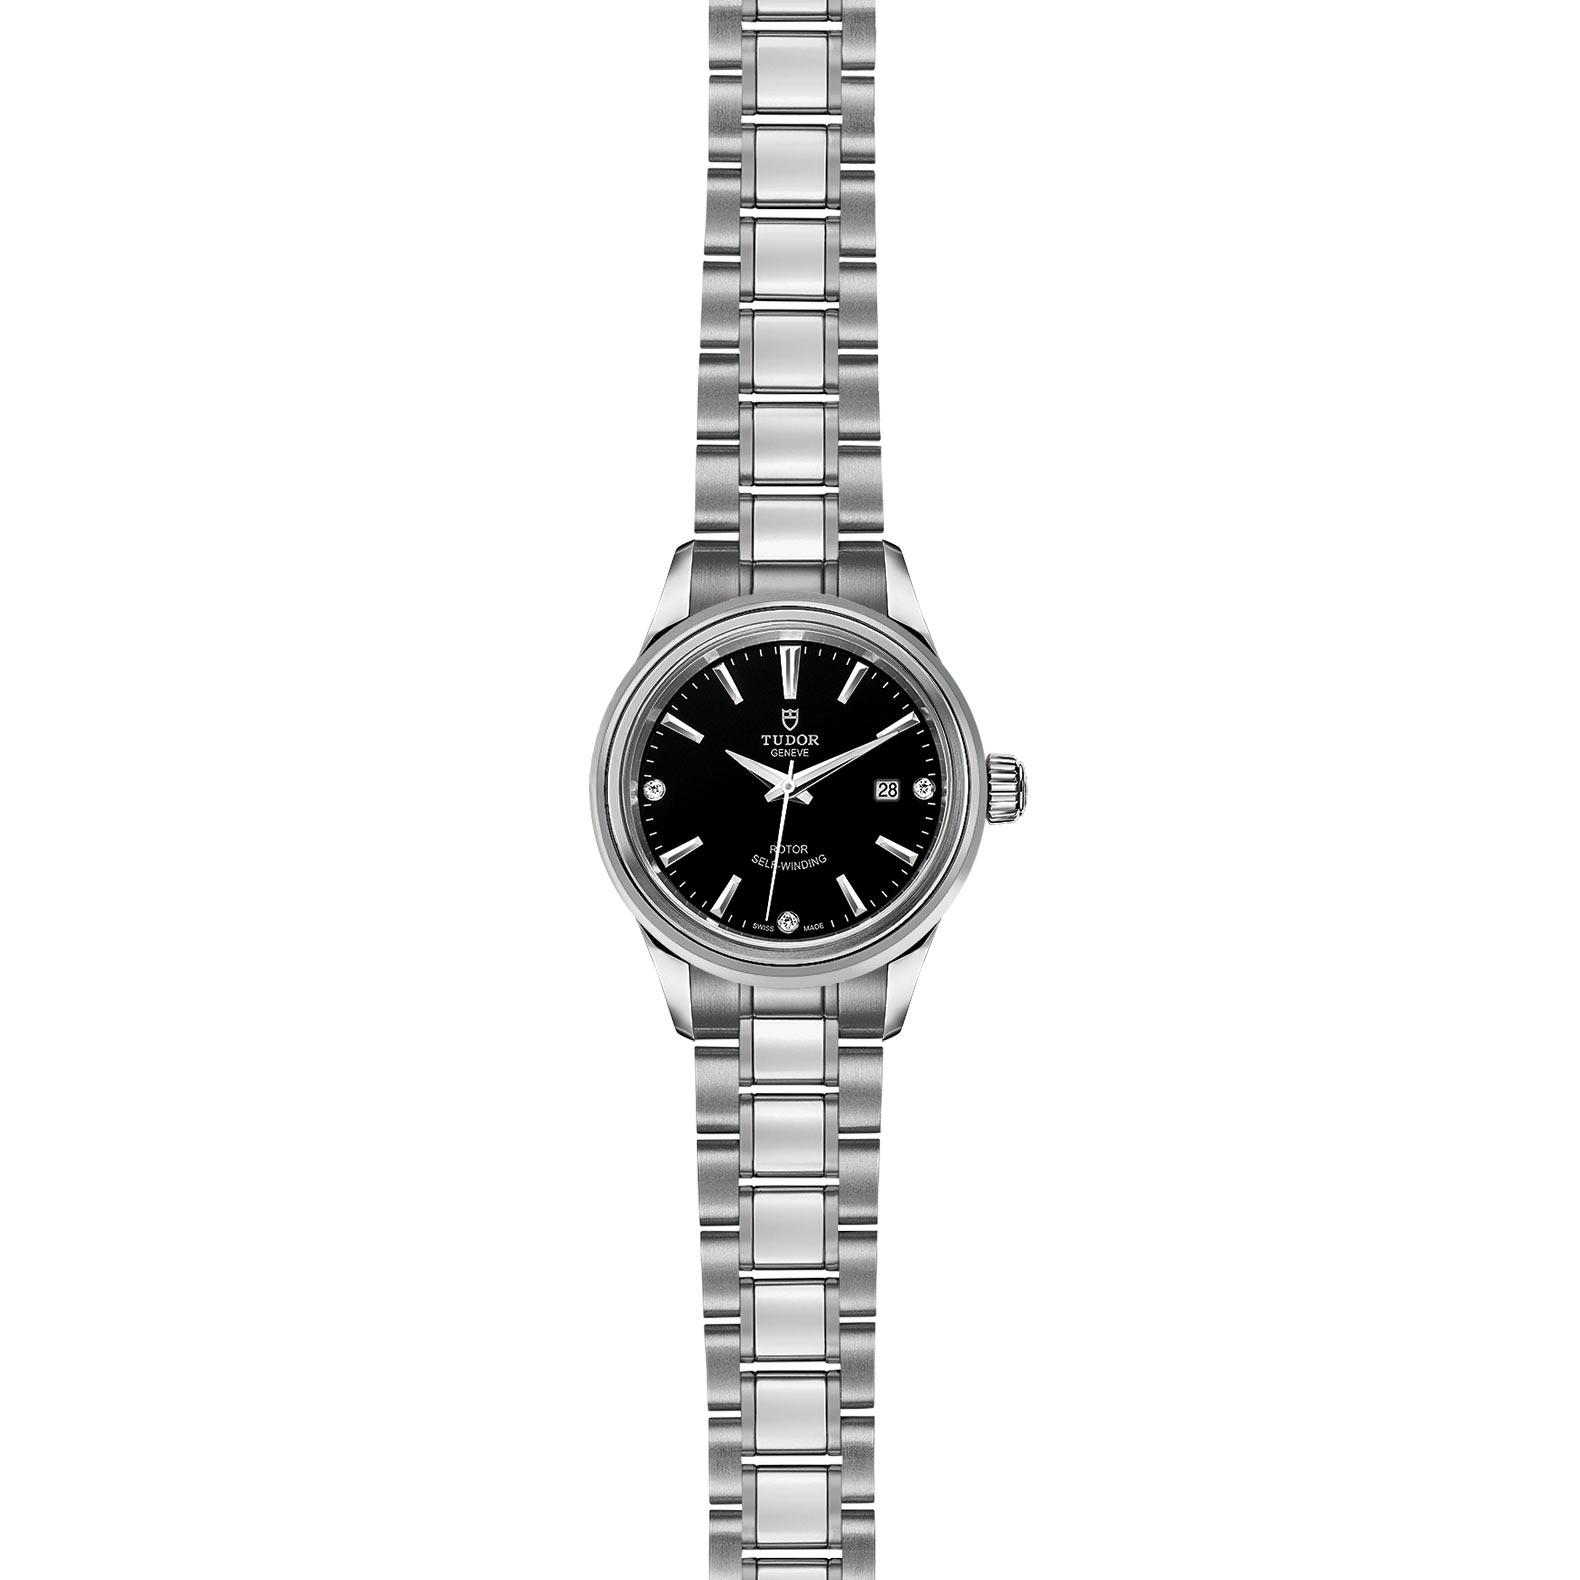 TUDOR Style M12100 0004 Frontfacing